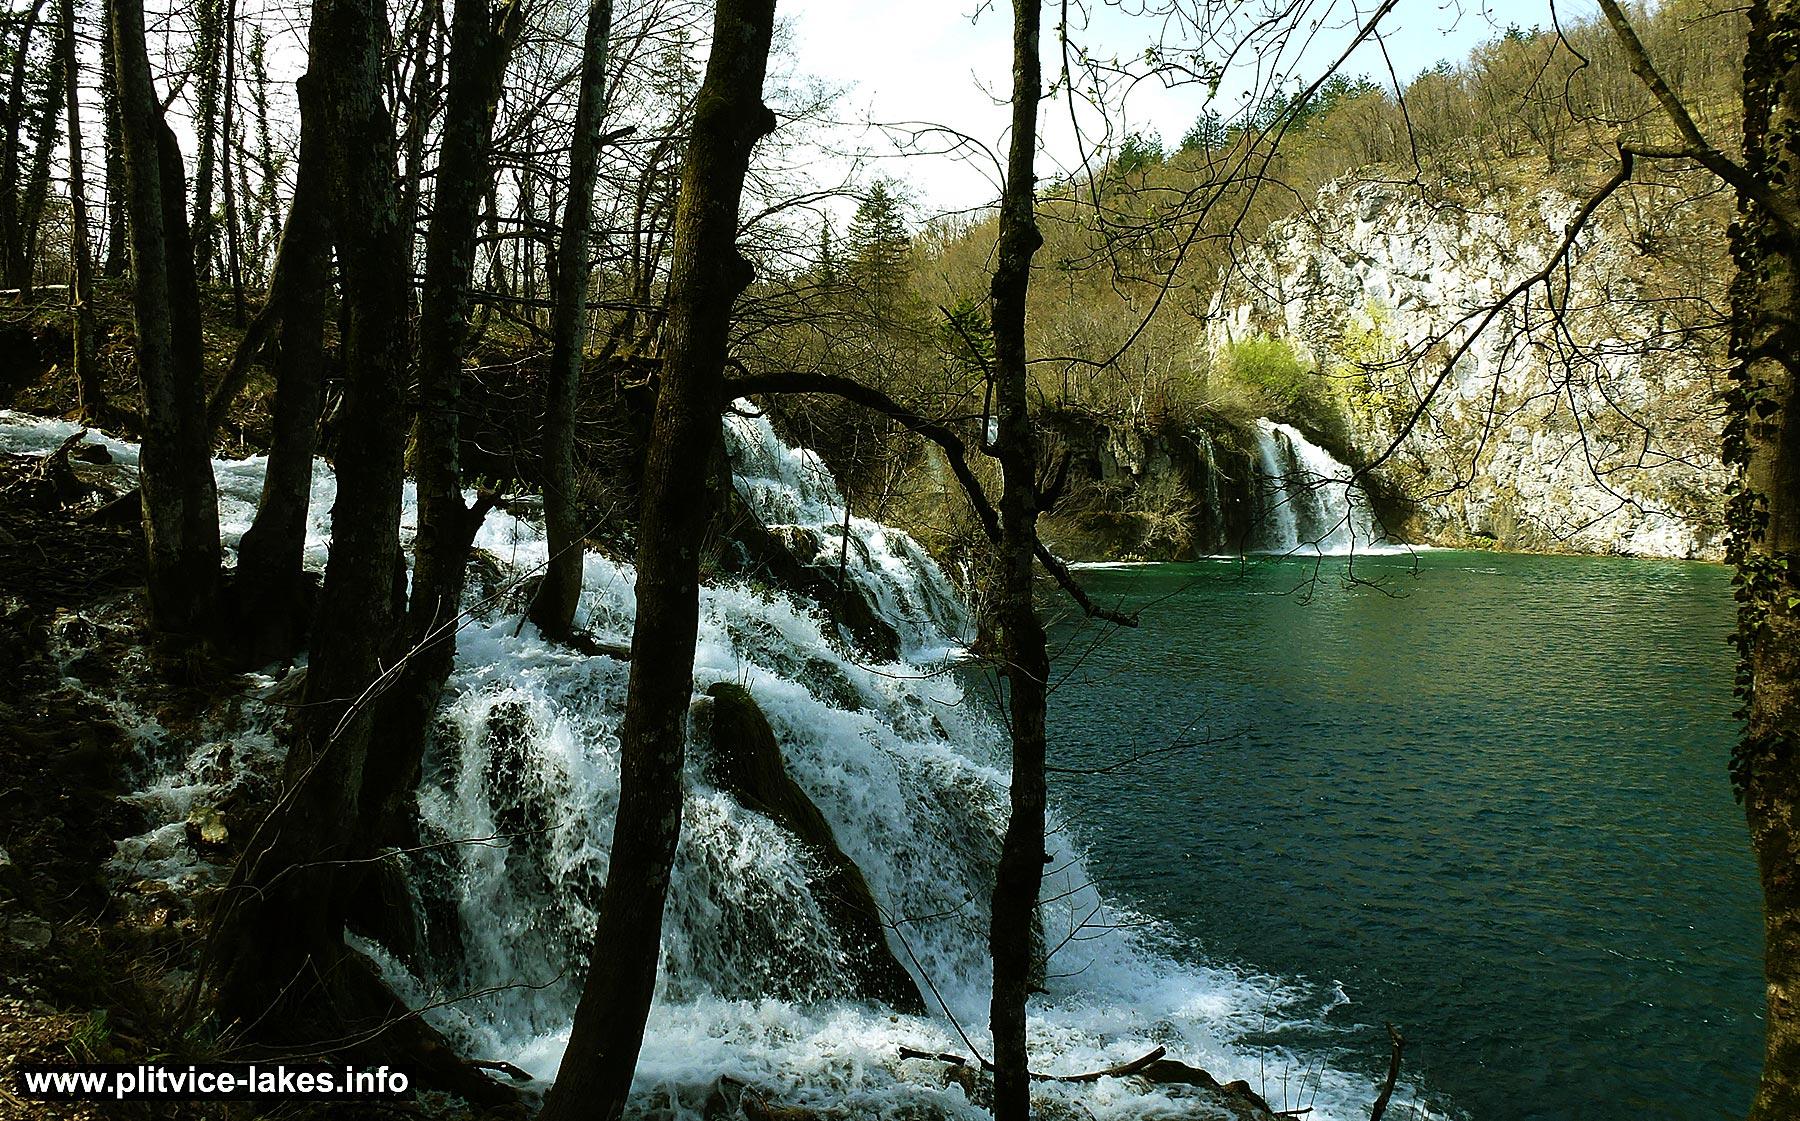 Milanovac Waterfalls and Cascades